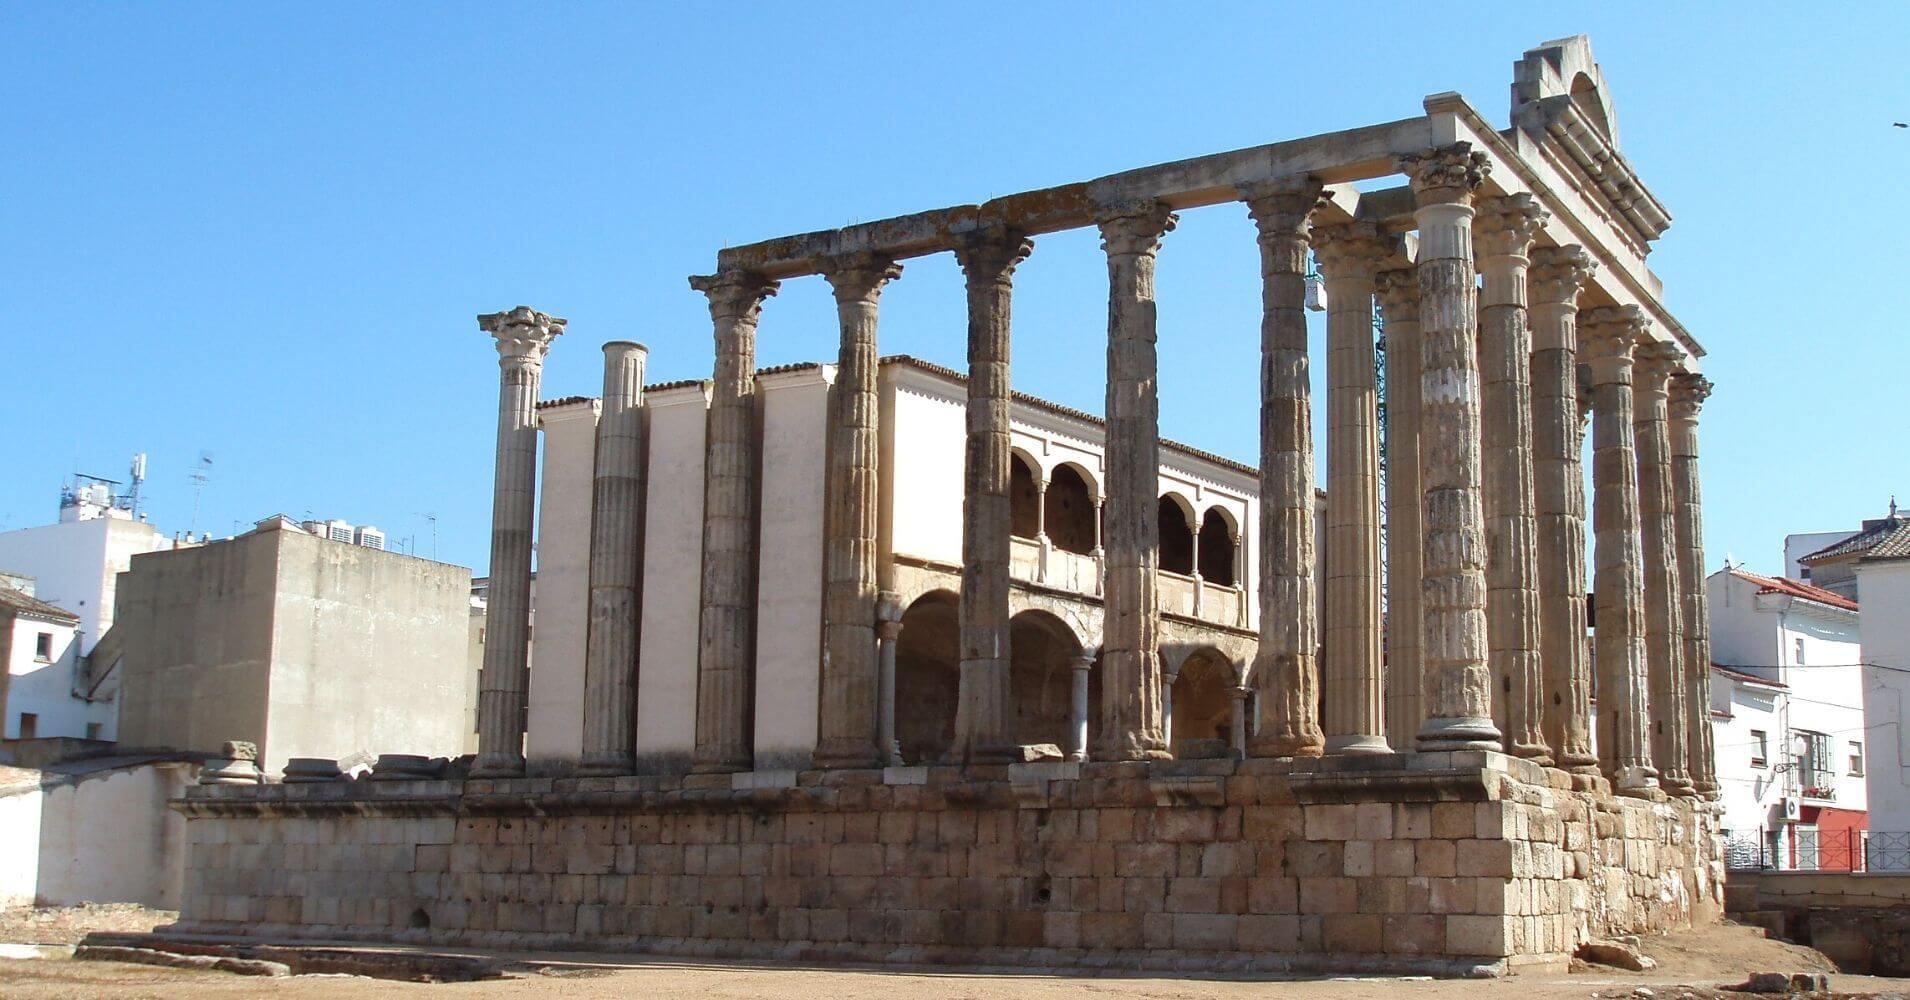 Templo de Diana. Mérida, Badajoz.